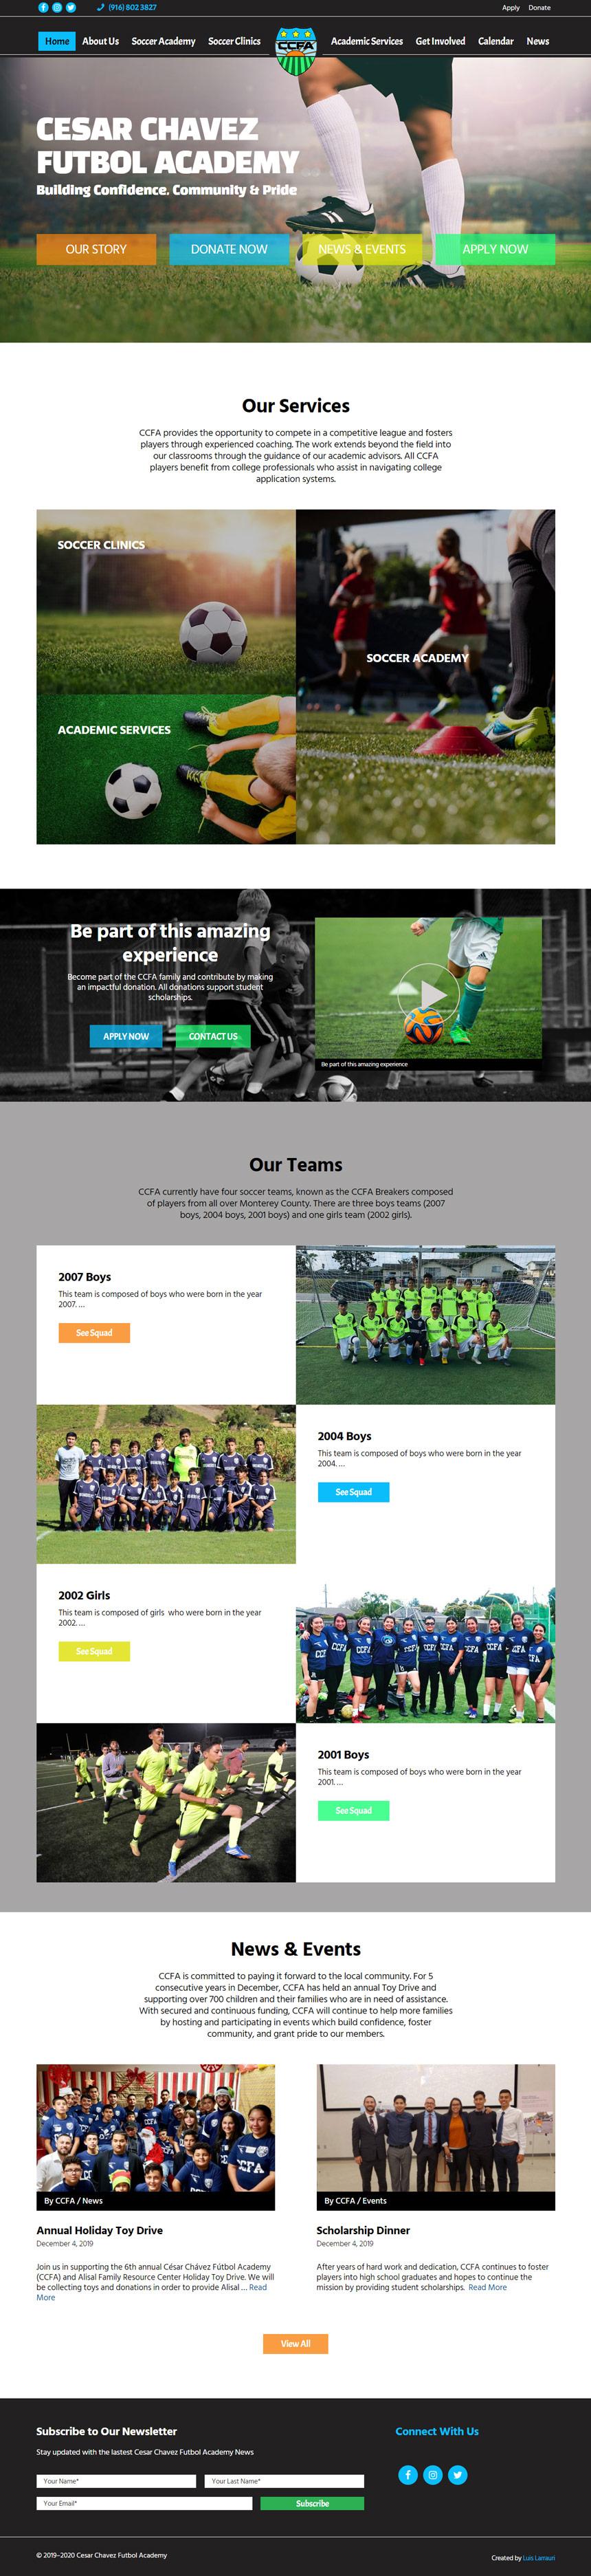 Cesar Chavez Futbol Academy Home Page